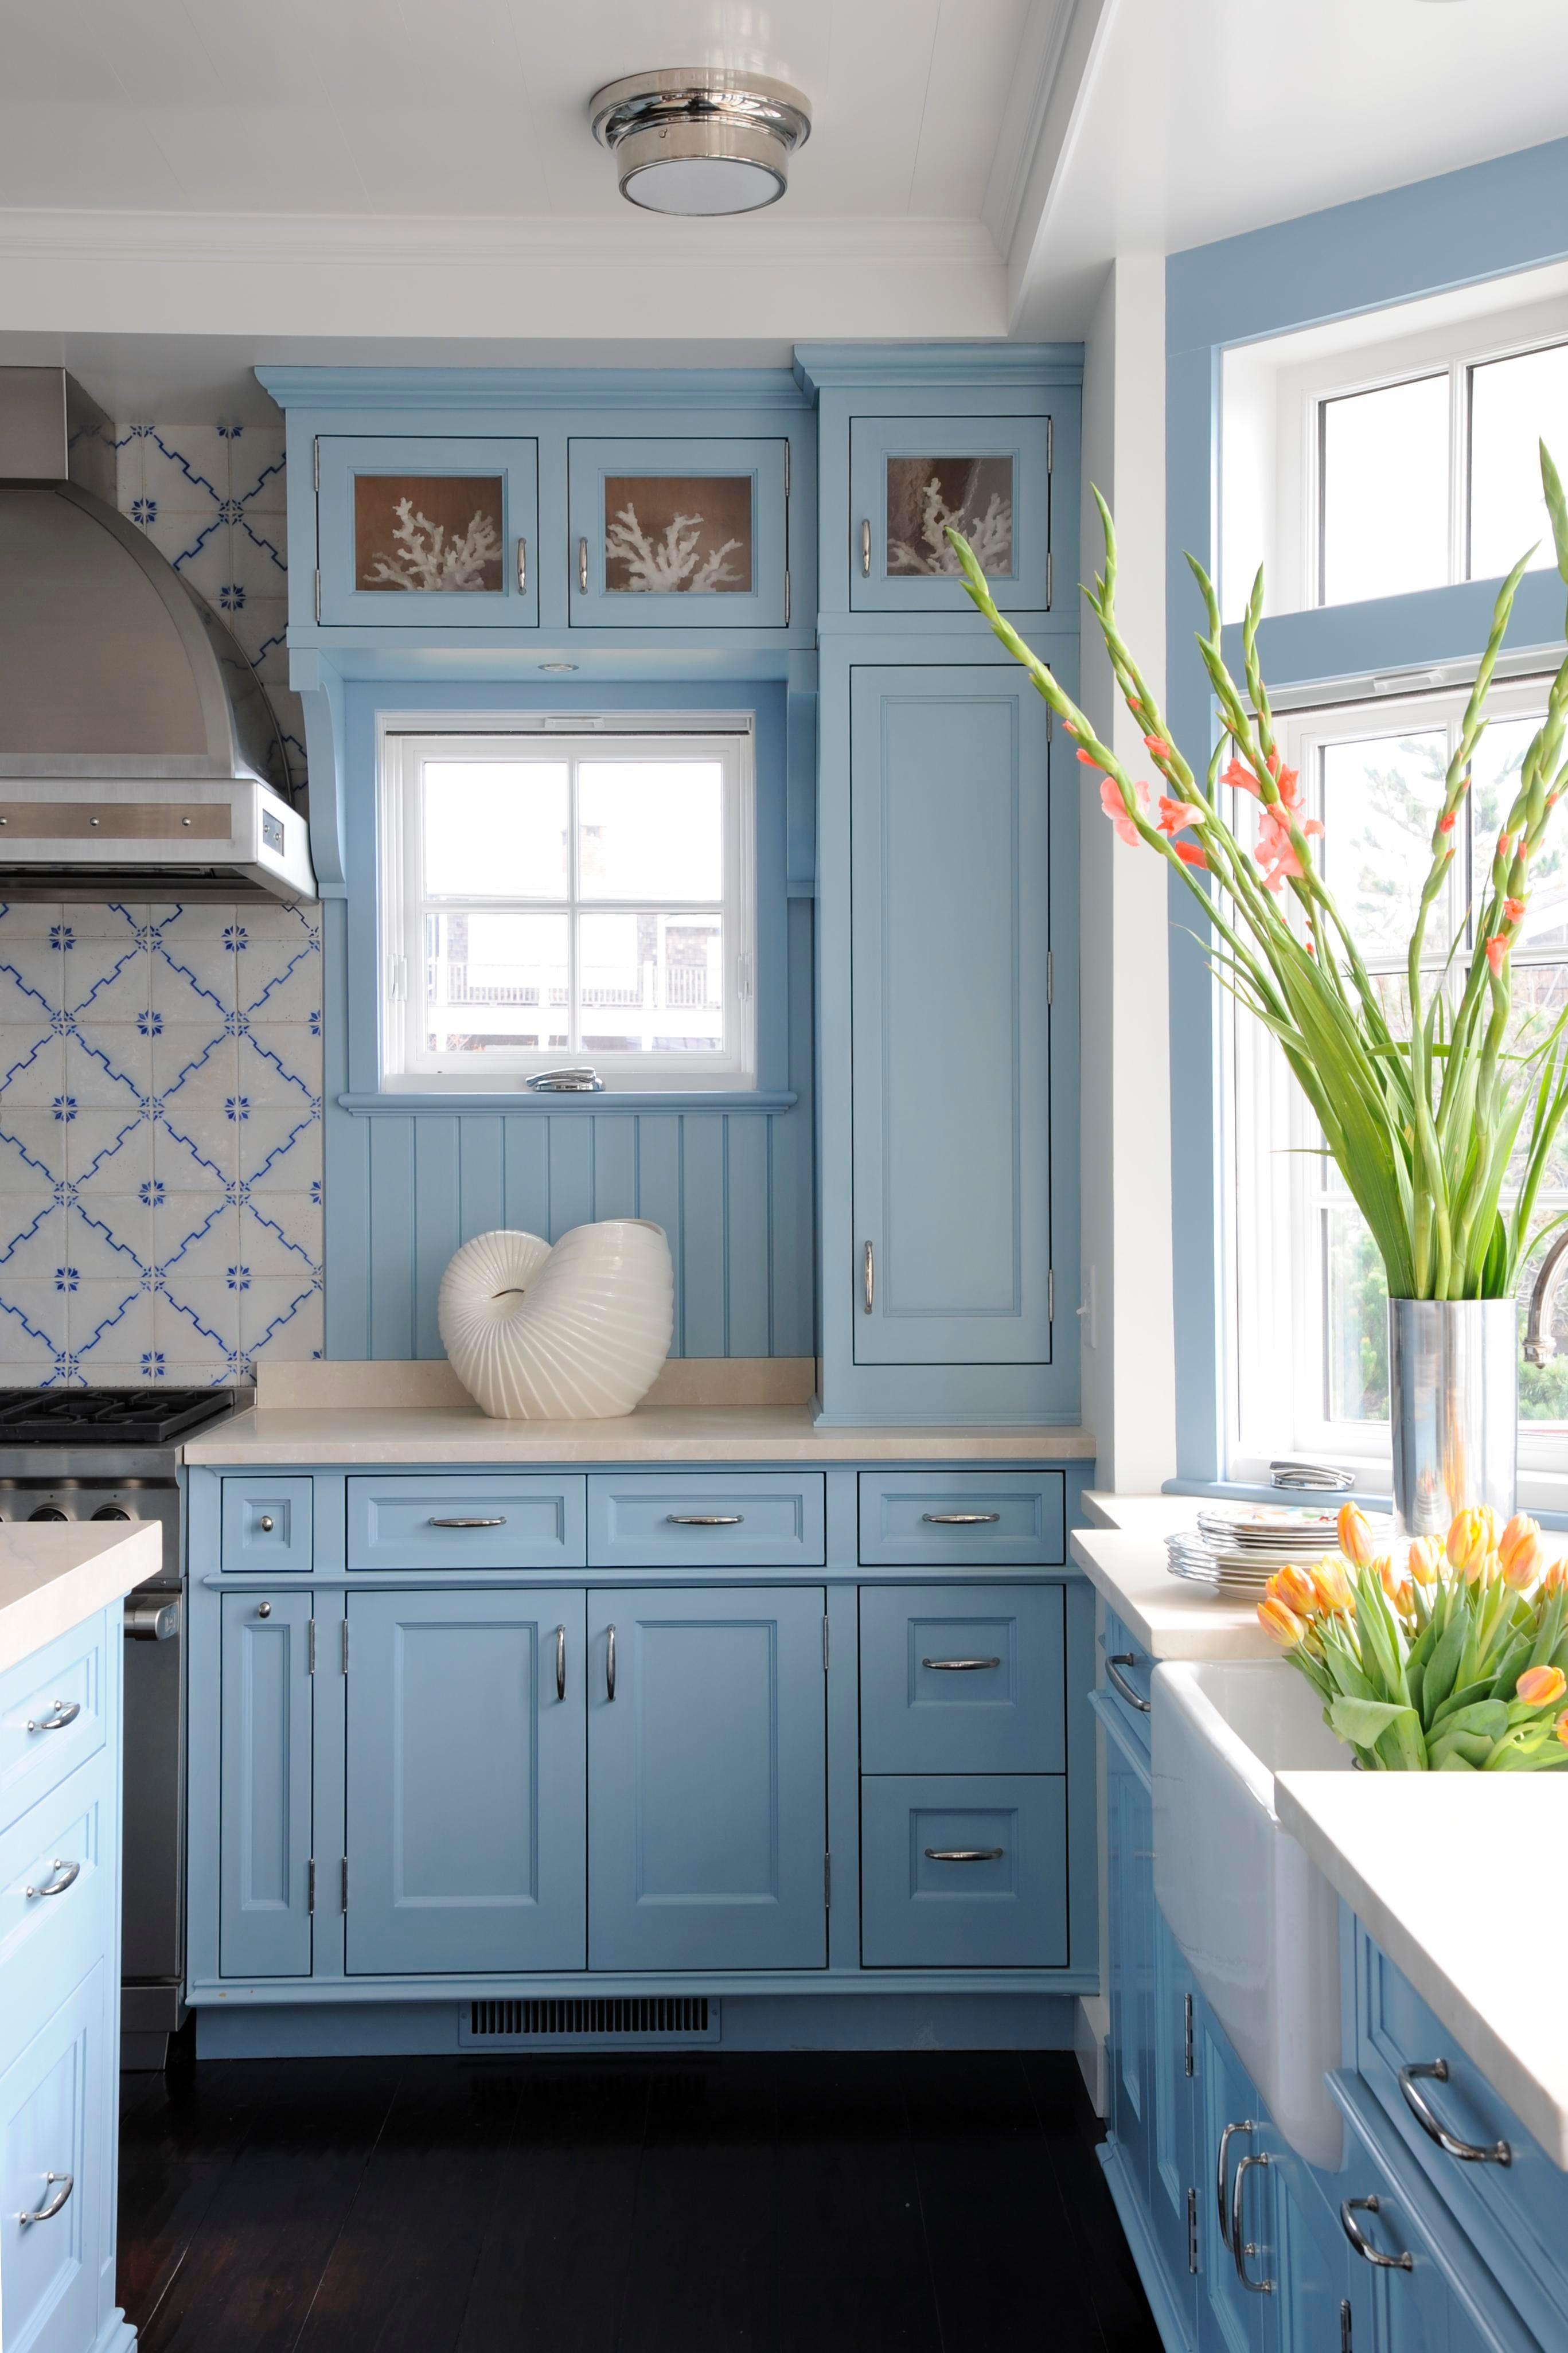 Allison.caccoma.inc.portfolio.interiors.kitchen.1501707694.7636797